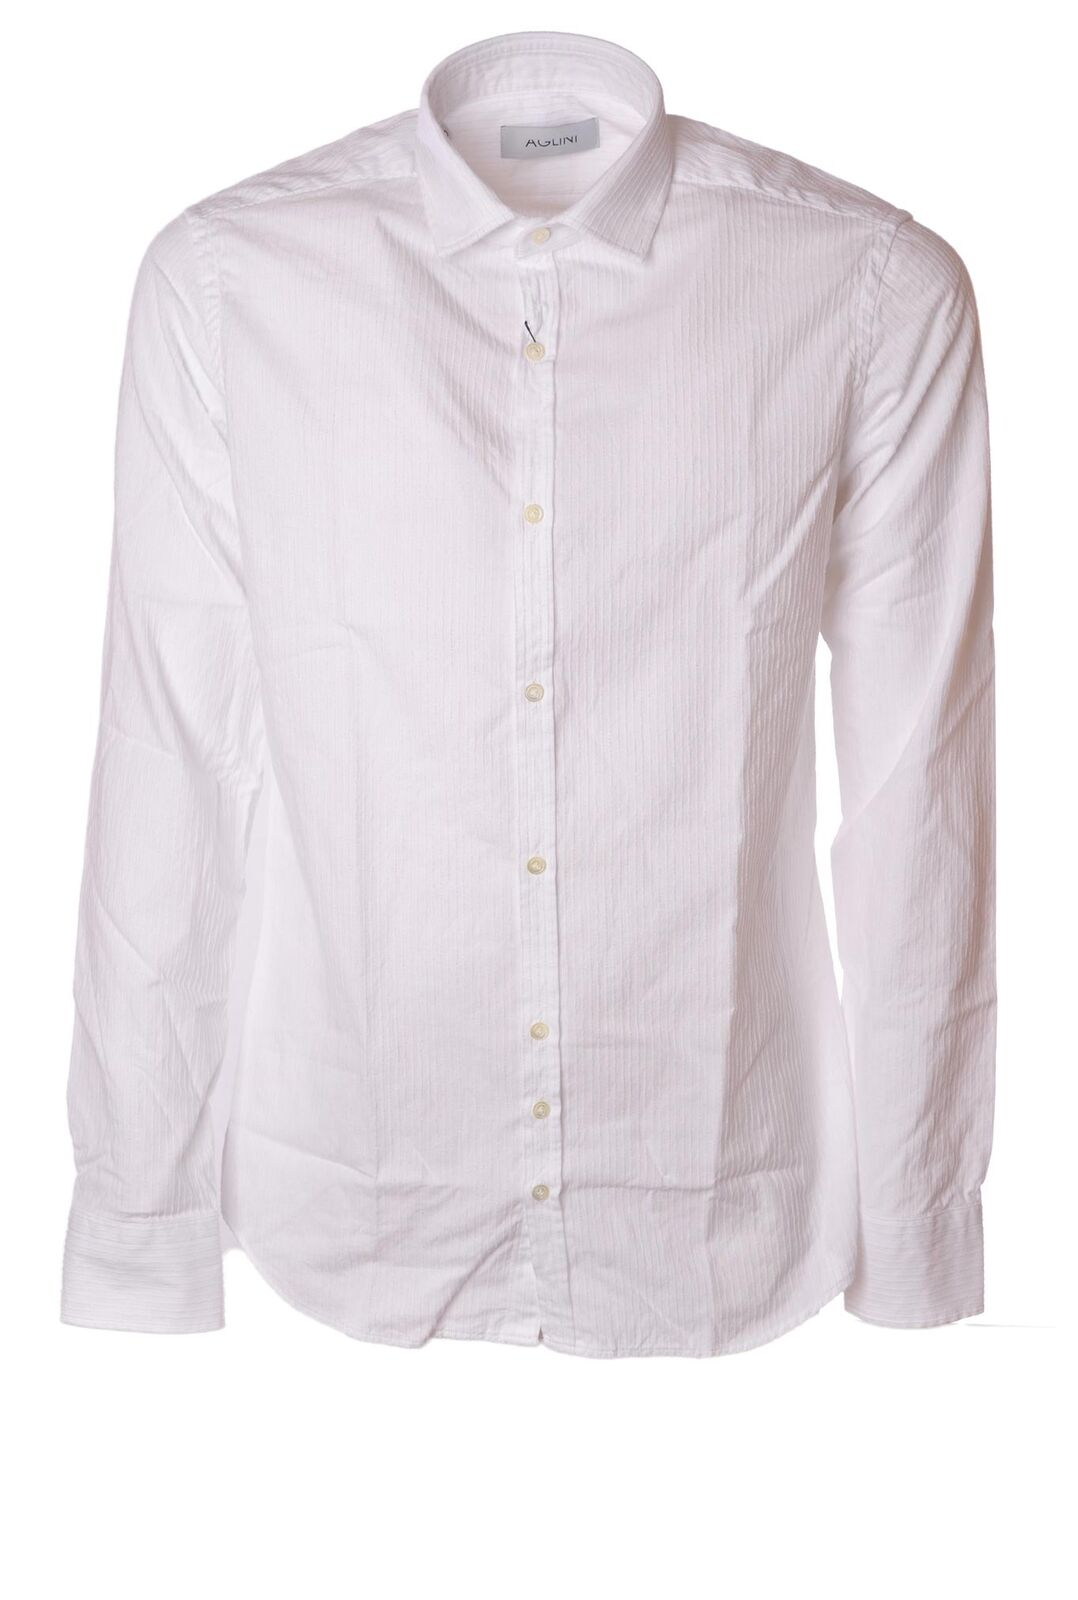 Aglini - Shirts-Shirt - Man - Weiß - 4332006E185716